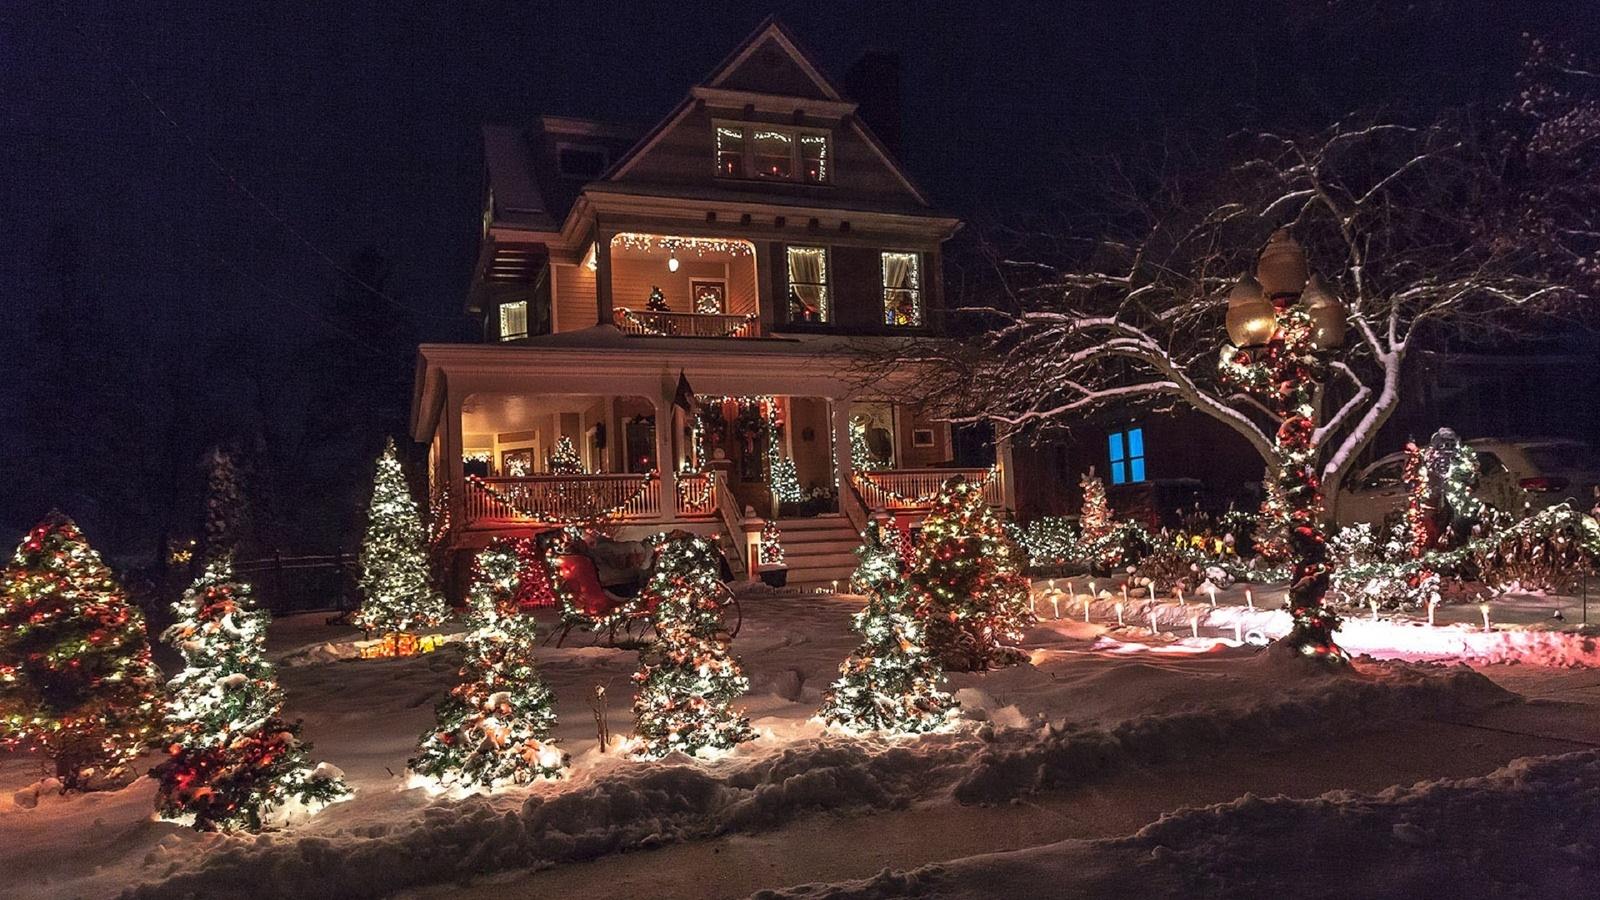 но��, огон�ки, нов�й год, домик, зима, �нег, п�аздник, елка, ве�е�